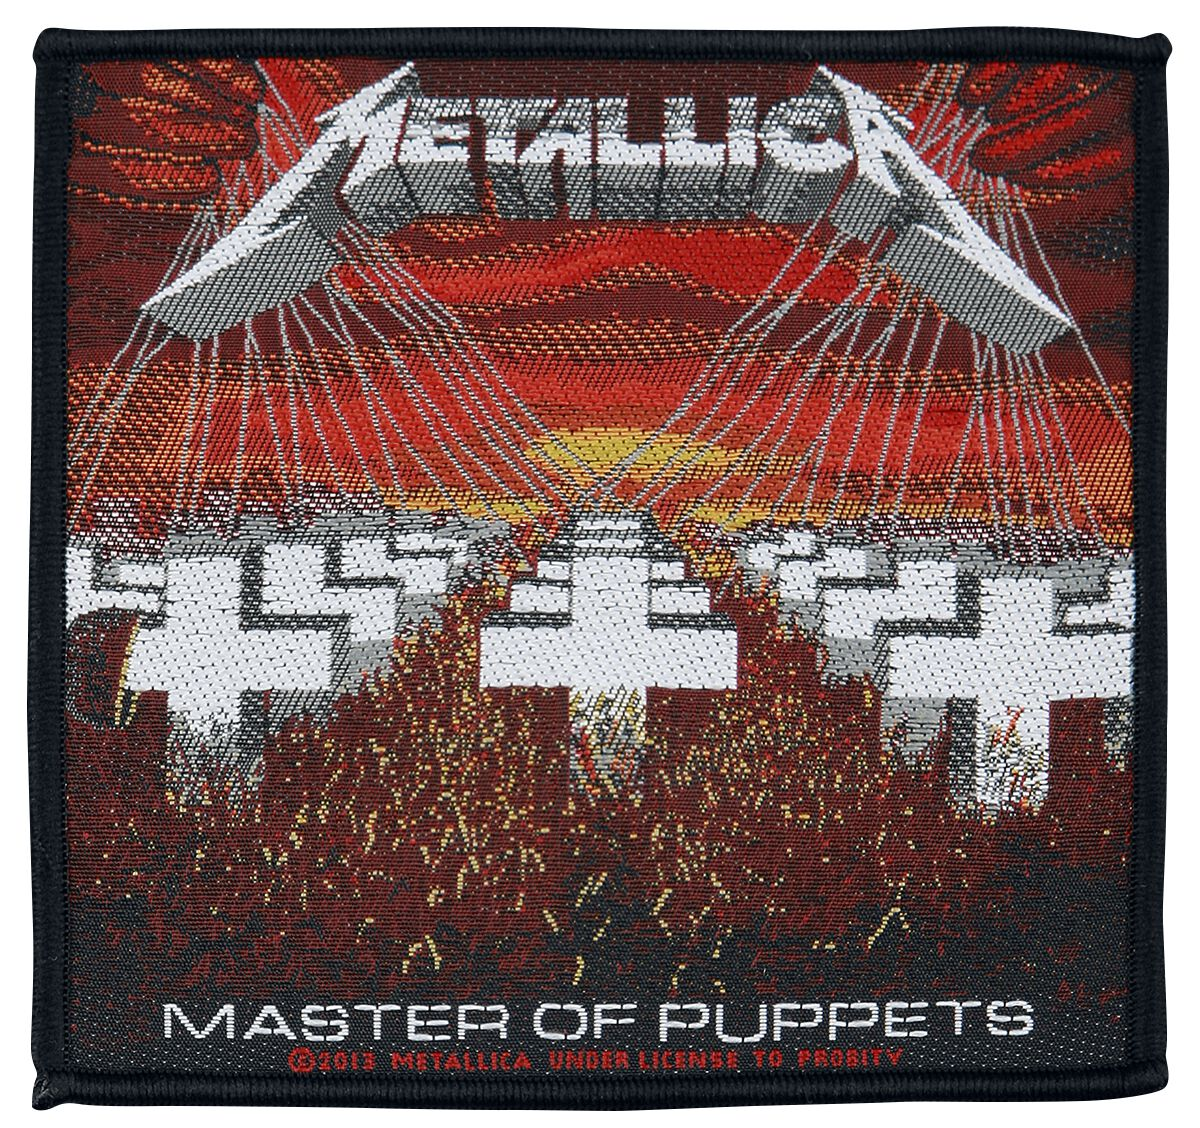 Metallica Master of puppets - None - Standard